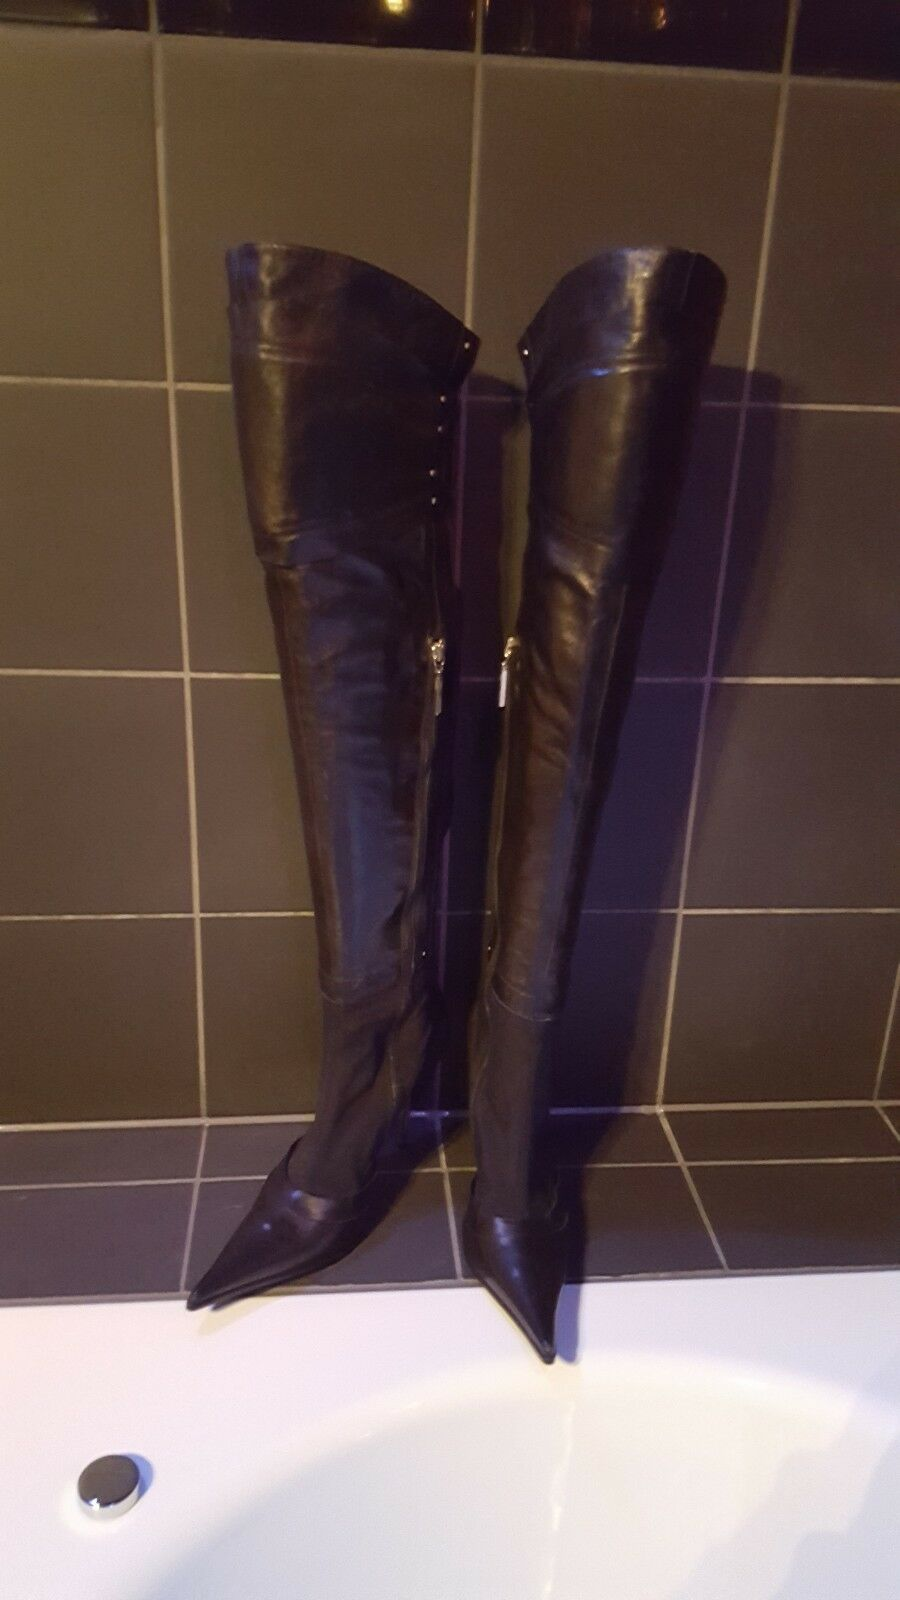 Overknee Stiefel Gianmarco Lorenzi Echt Leder Neuwertig Gr. 39